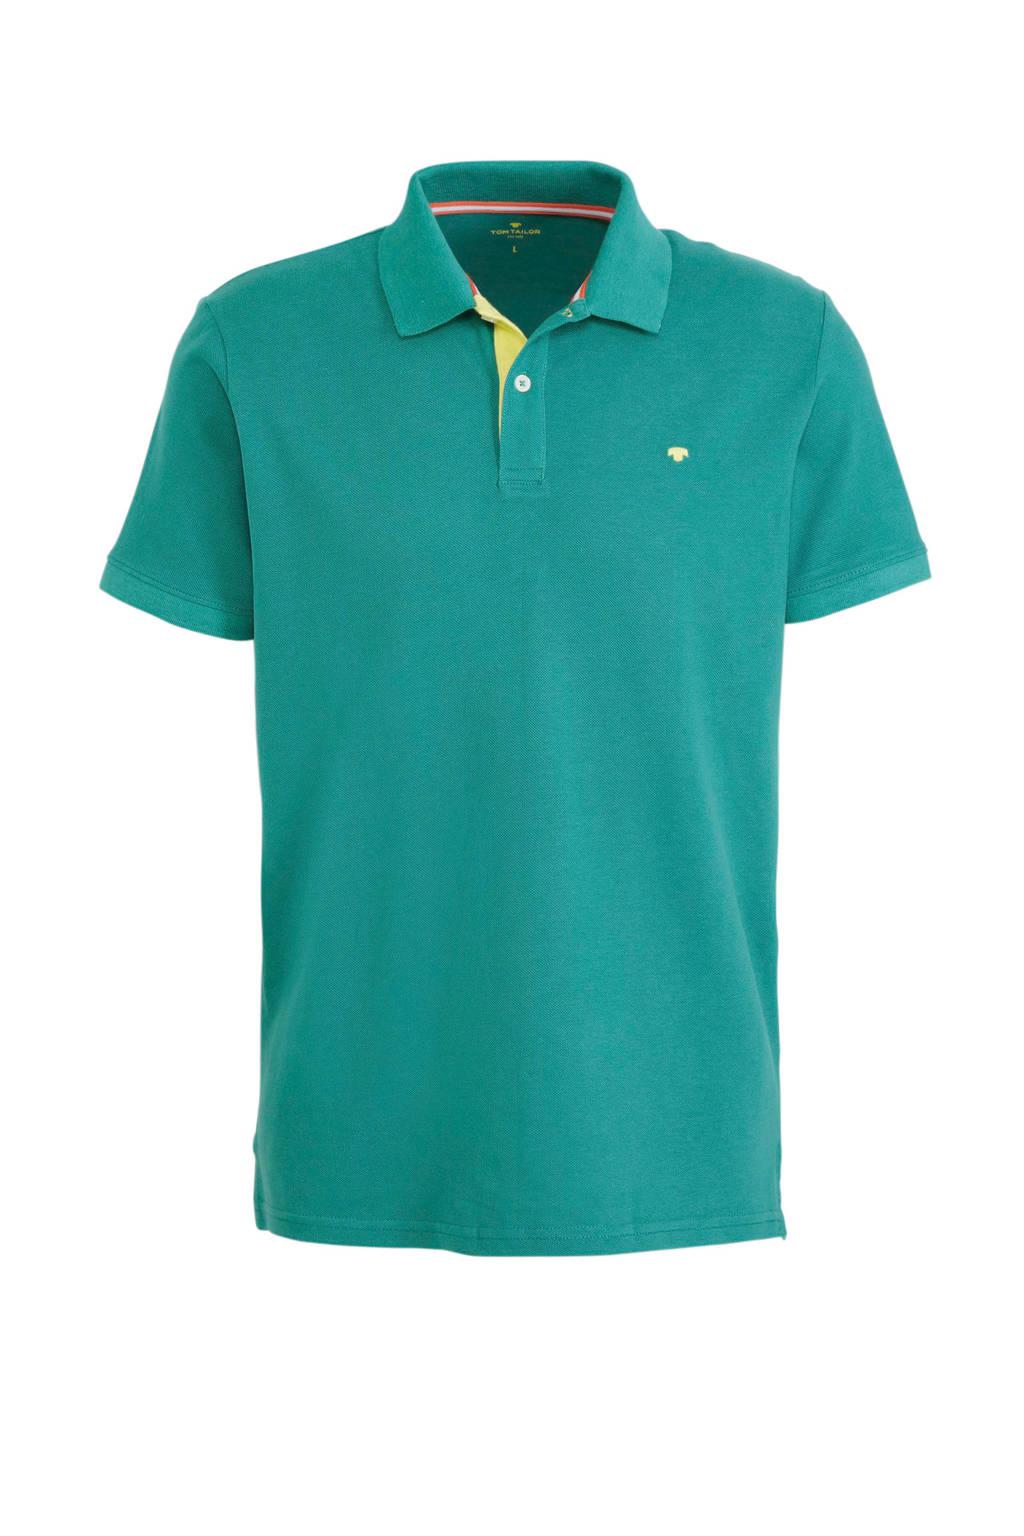 Tom Tailor regular fit polo met logo groen, Groen